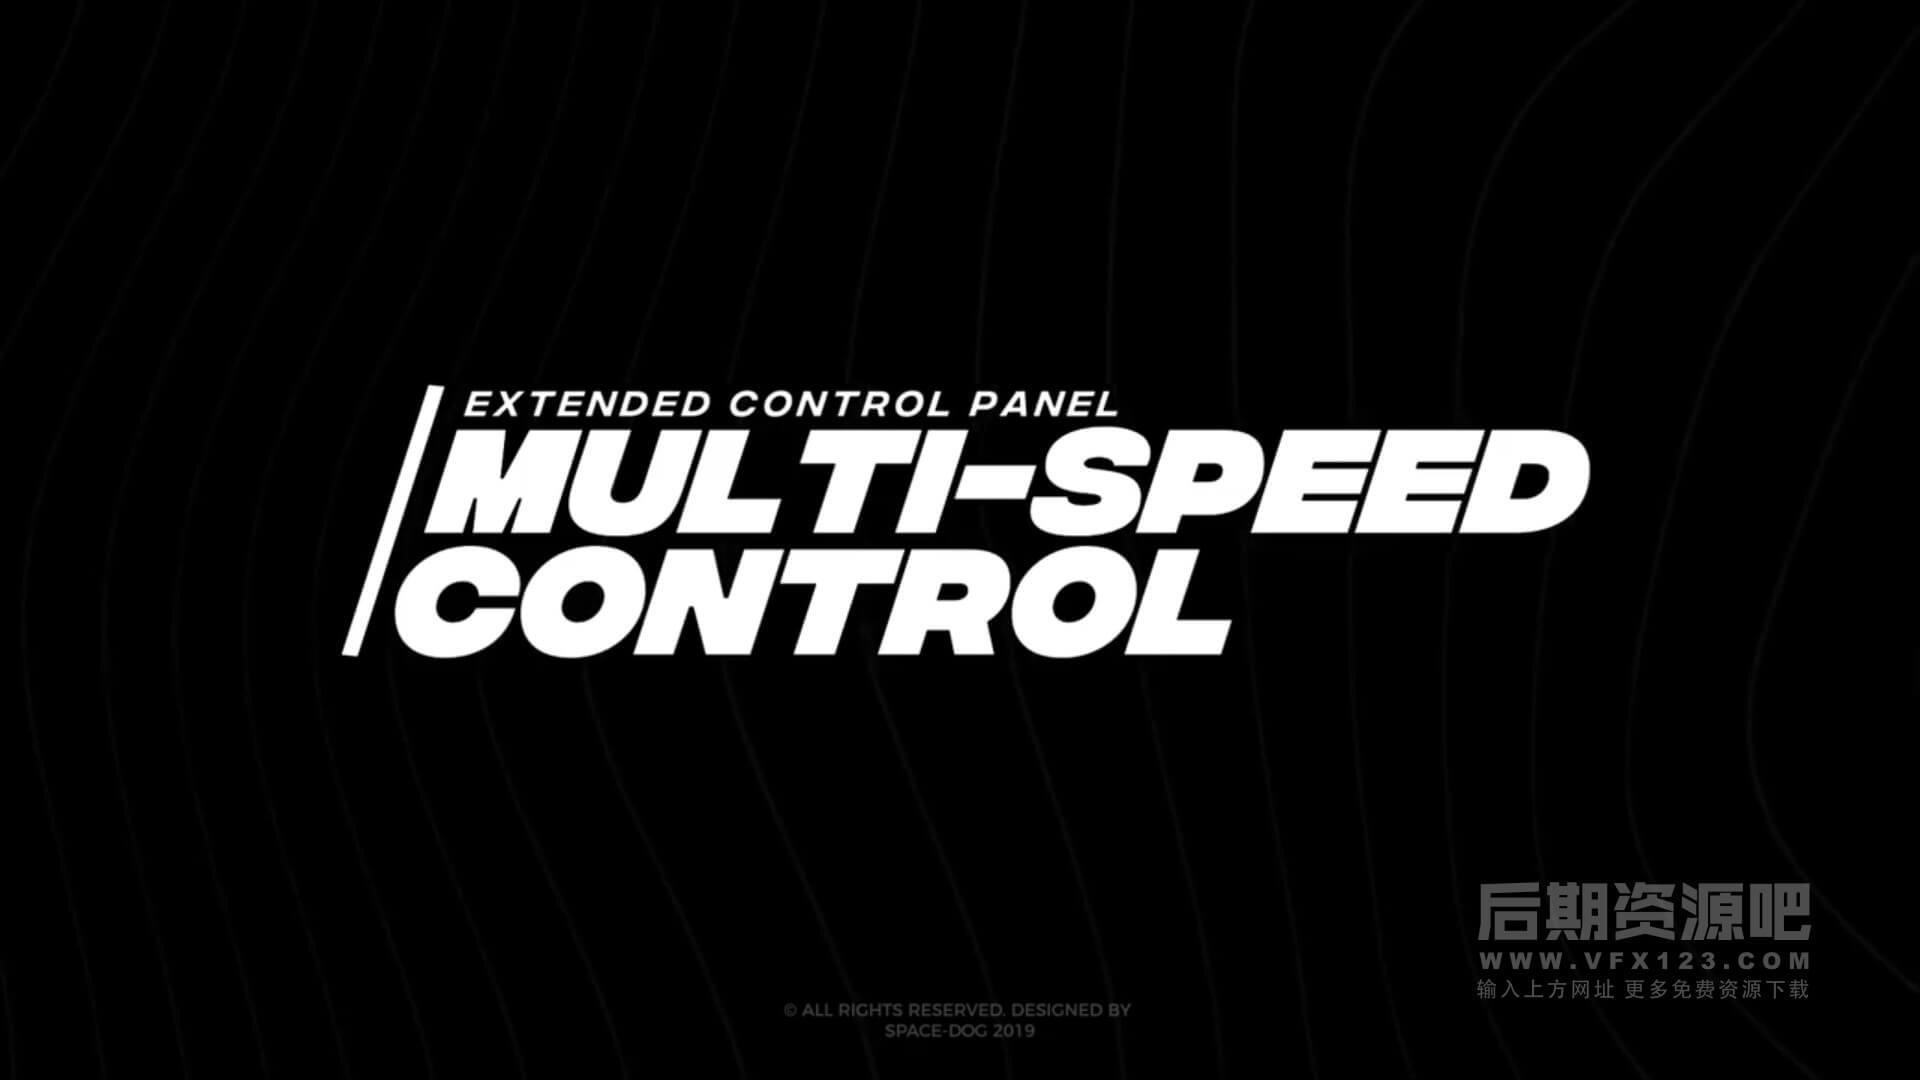 FCPX标题插件 22个黑白风格大字快闪片头字幕模板